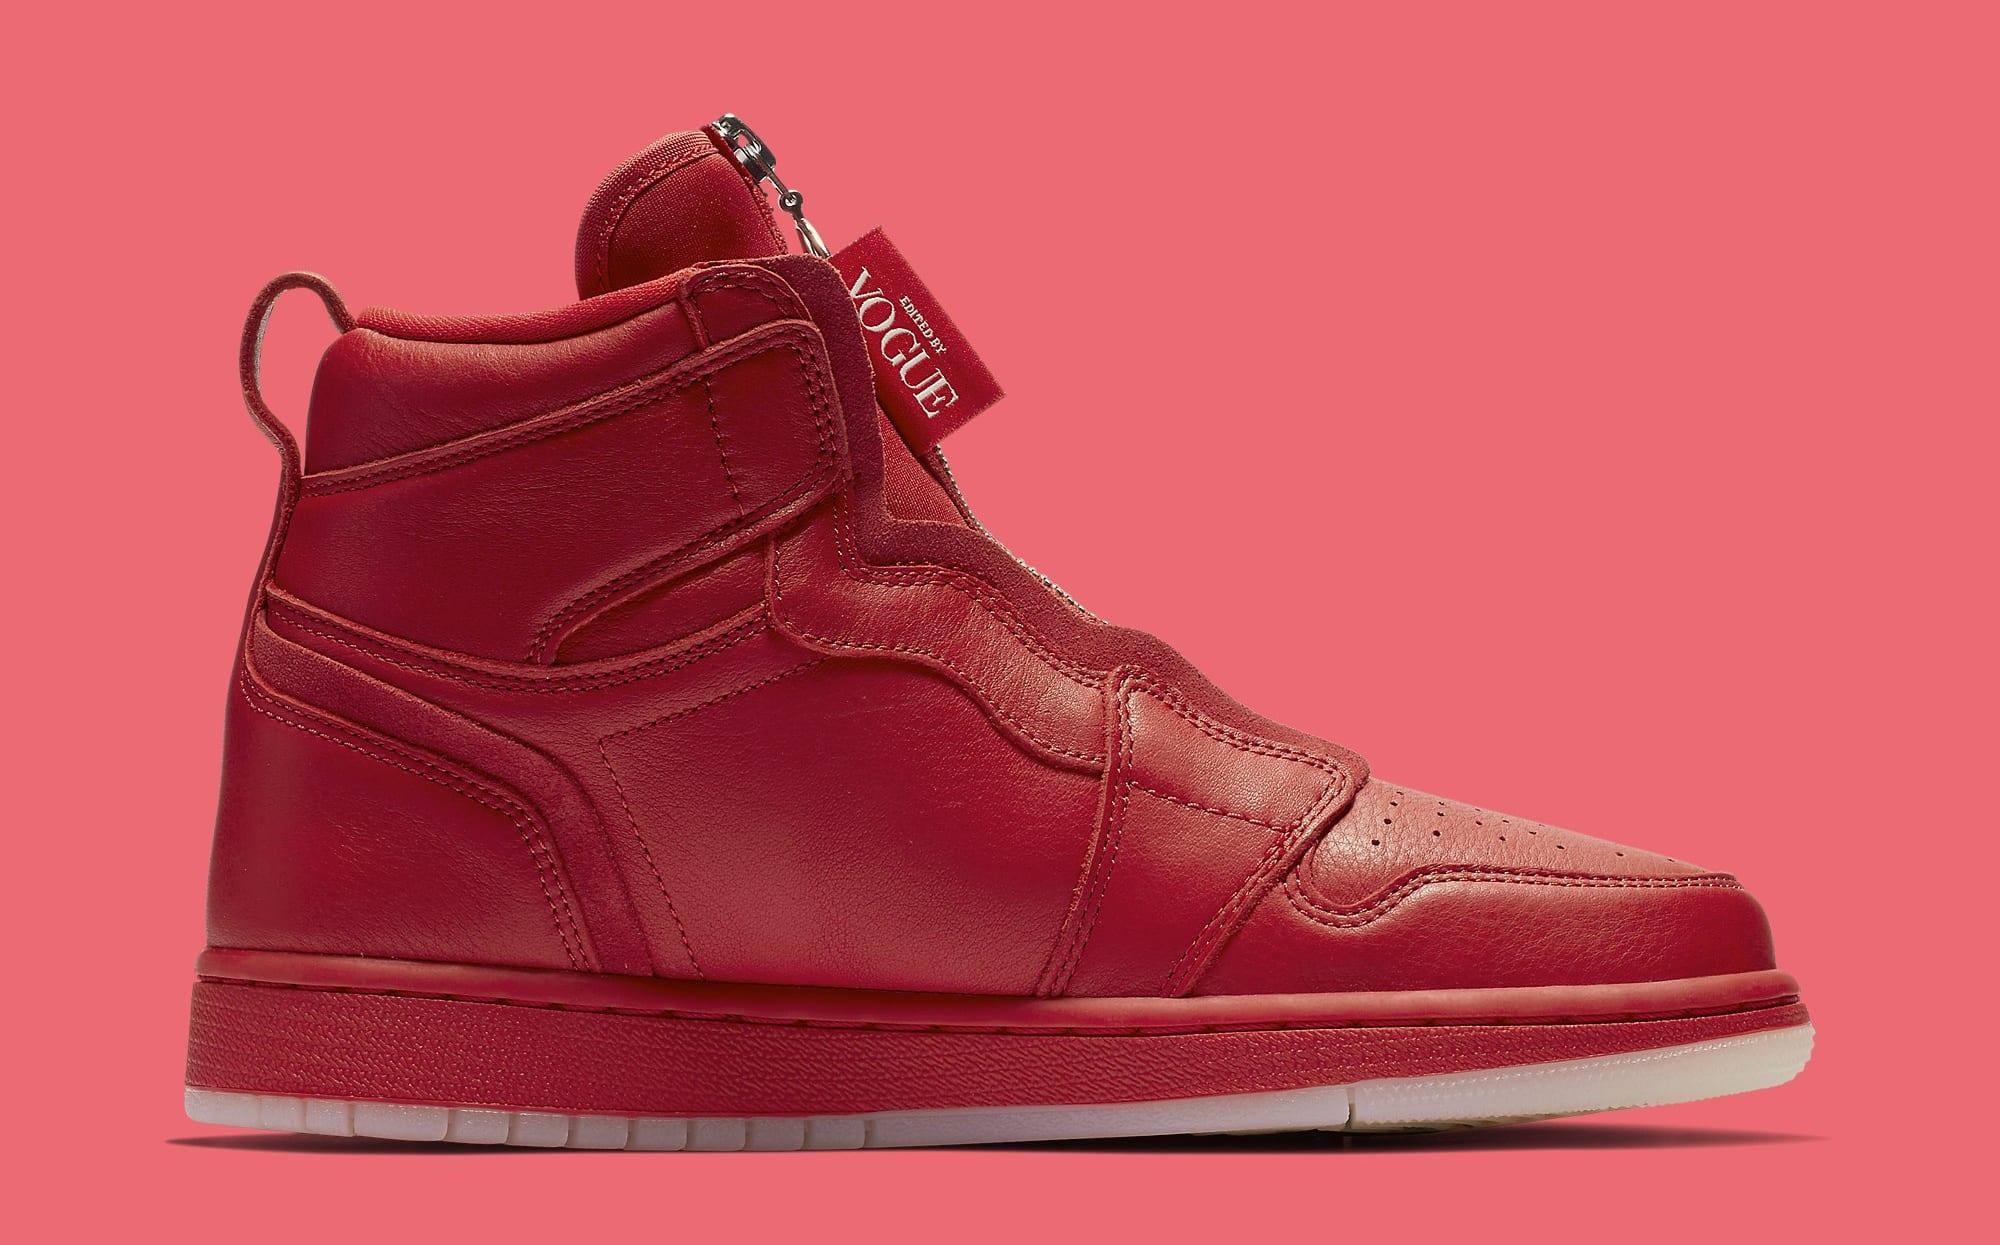 Vogue x Air Jordan 1 Zip AWOK University Red Medial